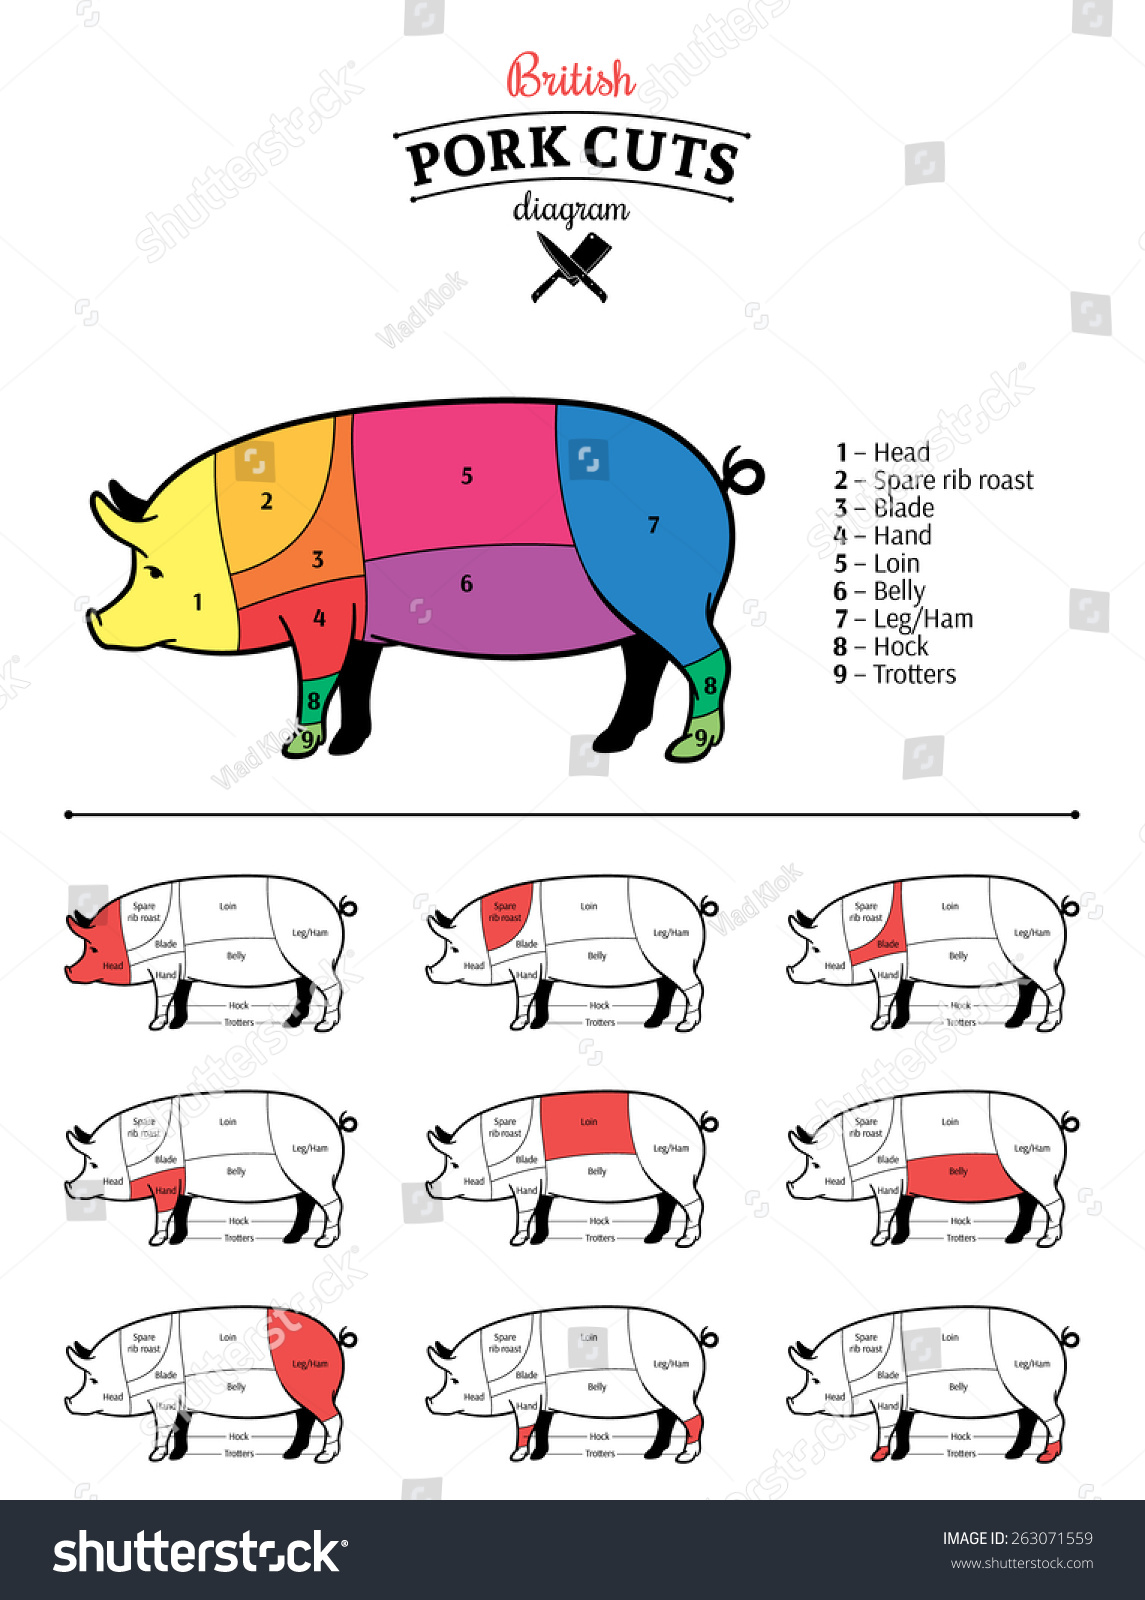 stock vector british pork cuts diagram 263071559 british pork cuts diagram stock vector (royalty free) 263071559